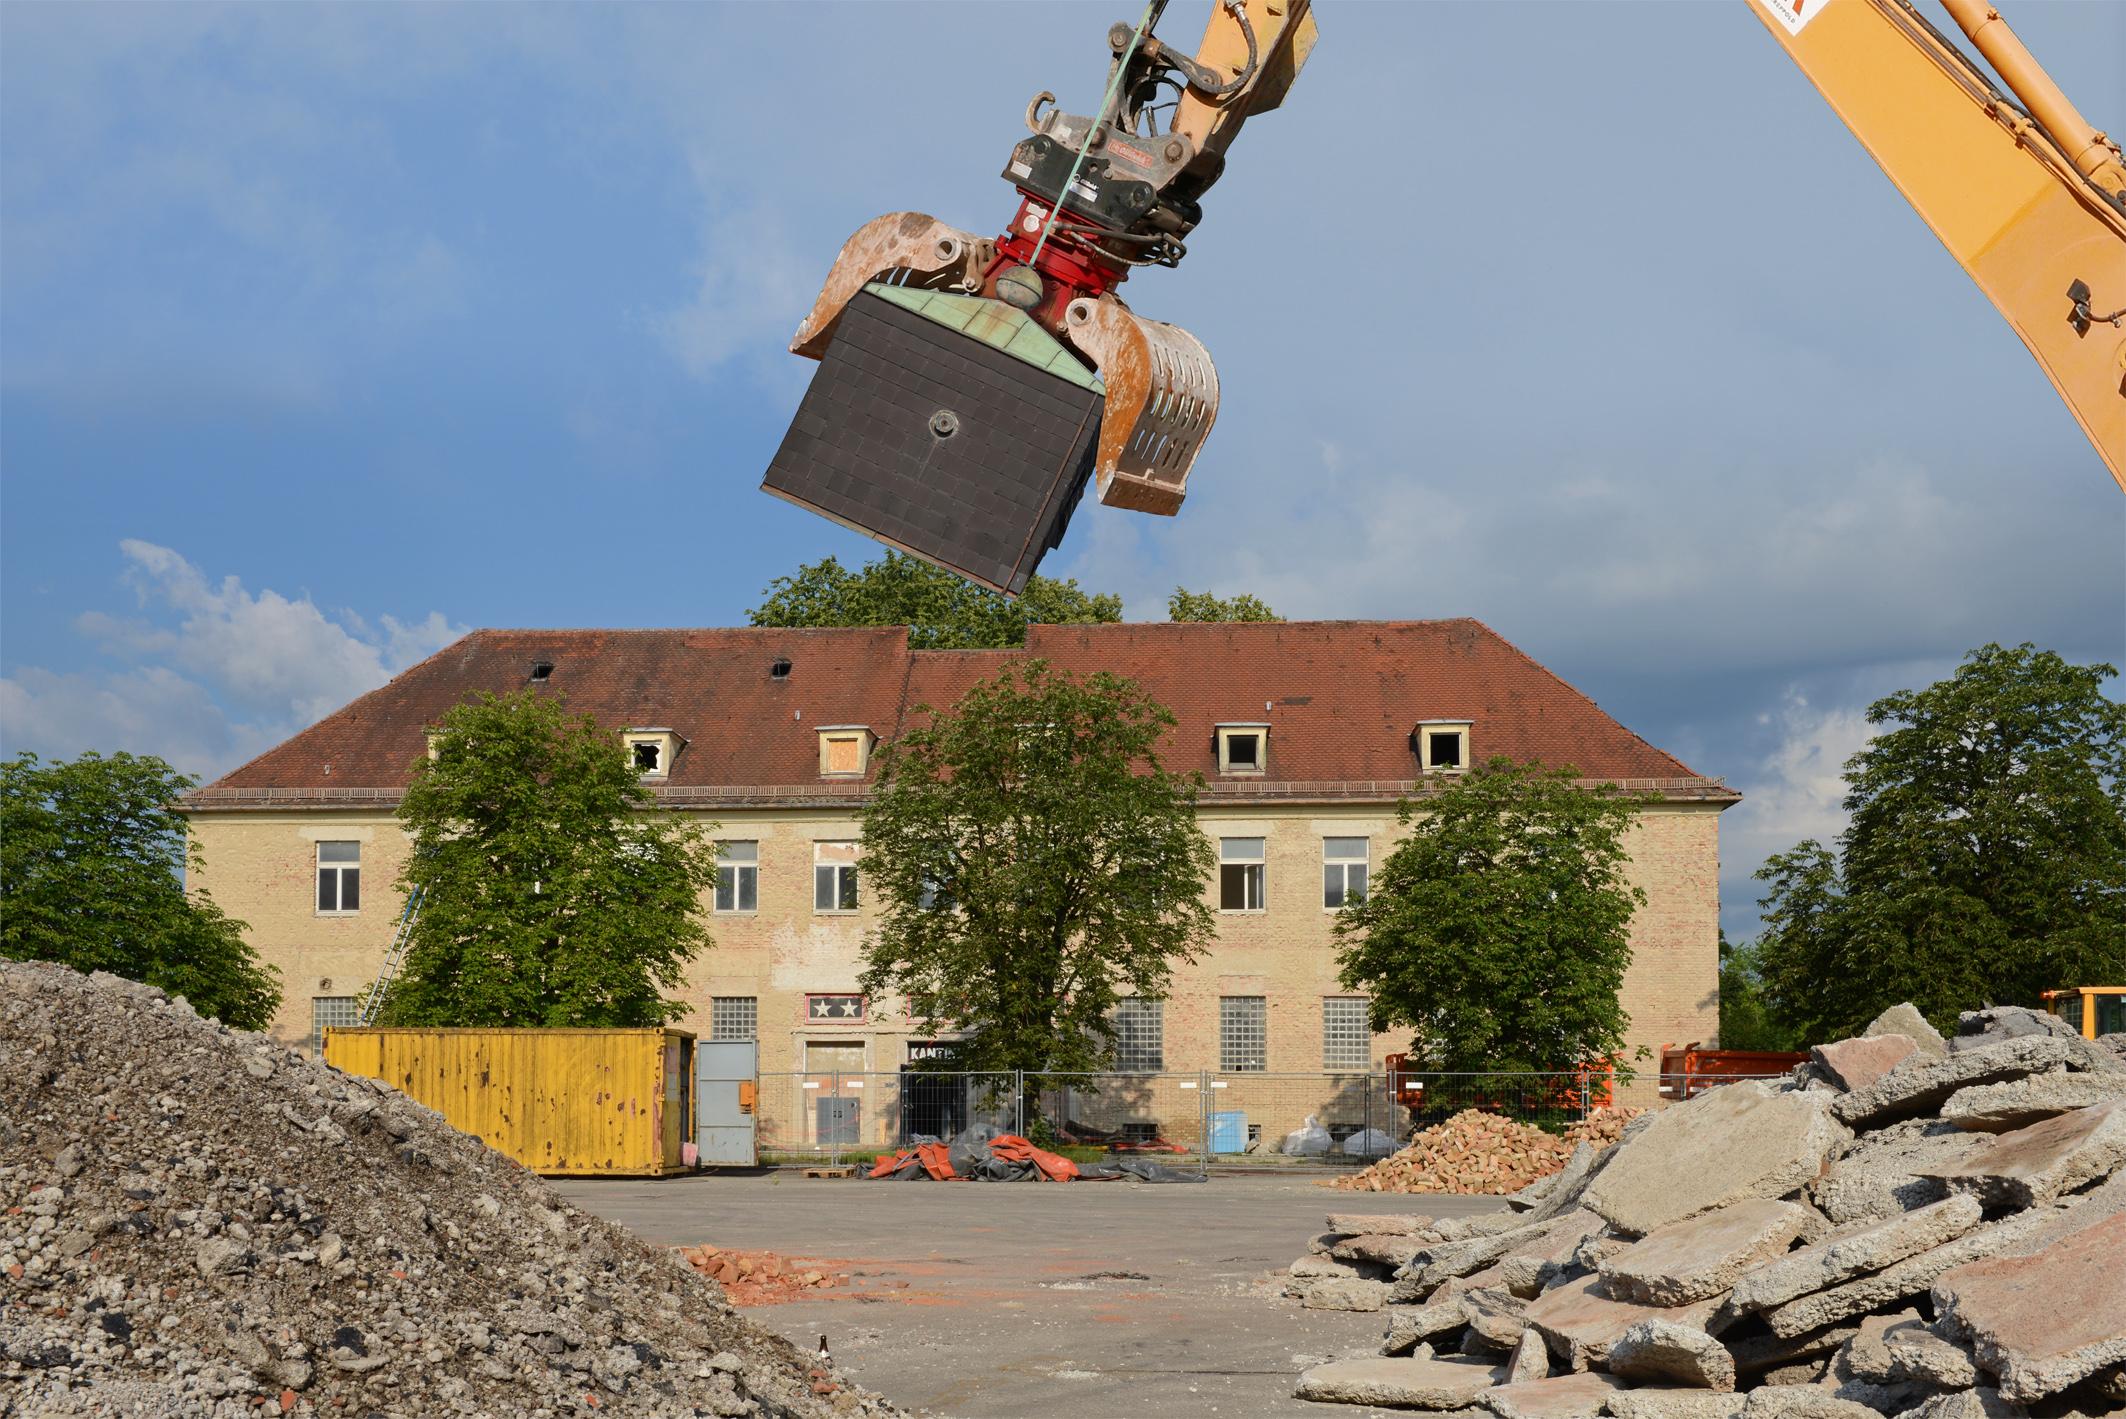 Reese-Areal Kantine, Augsburg